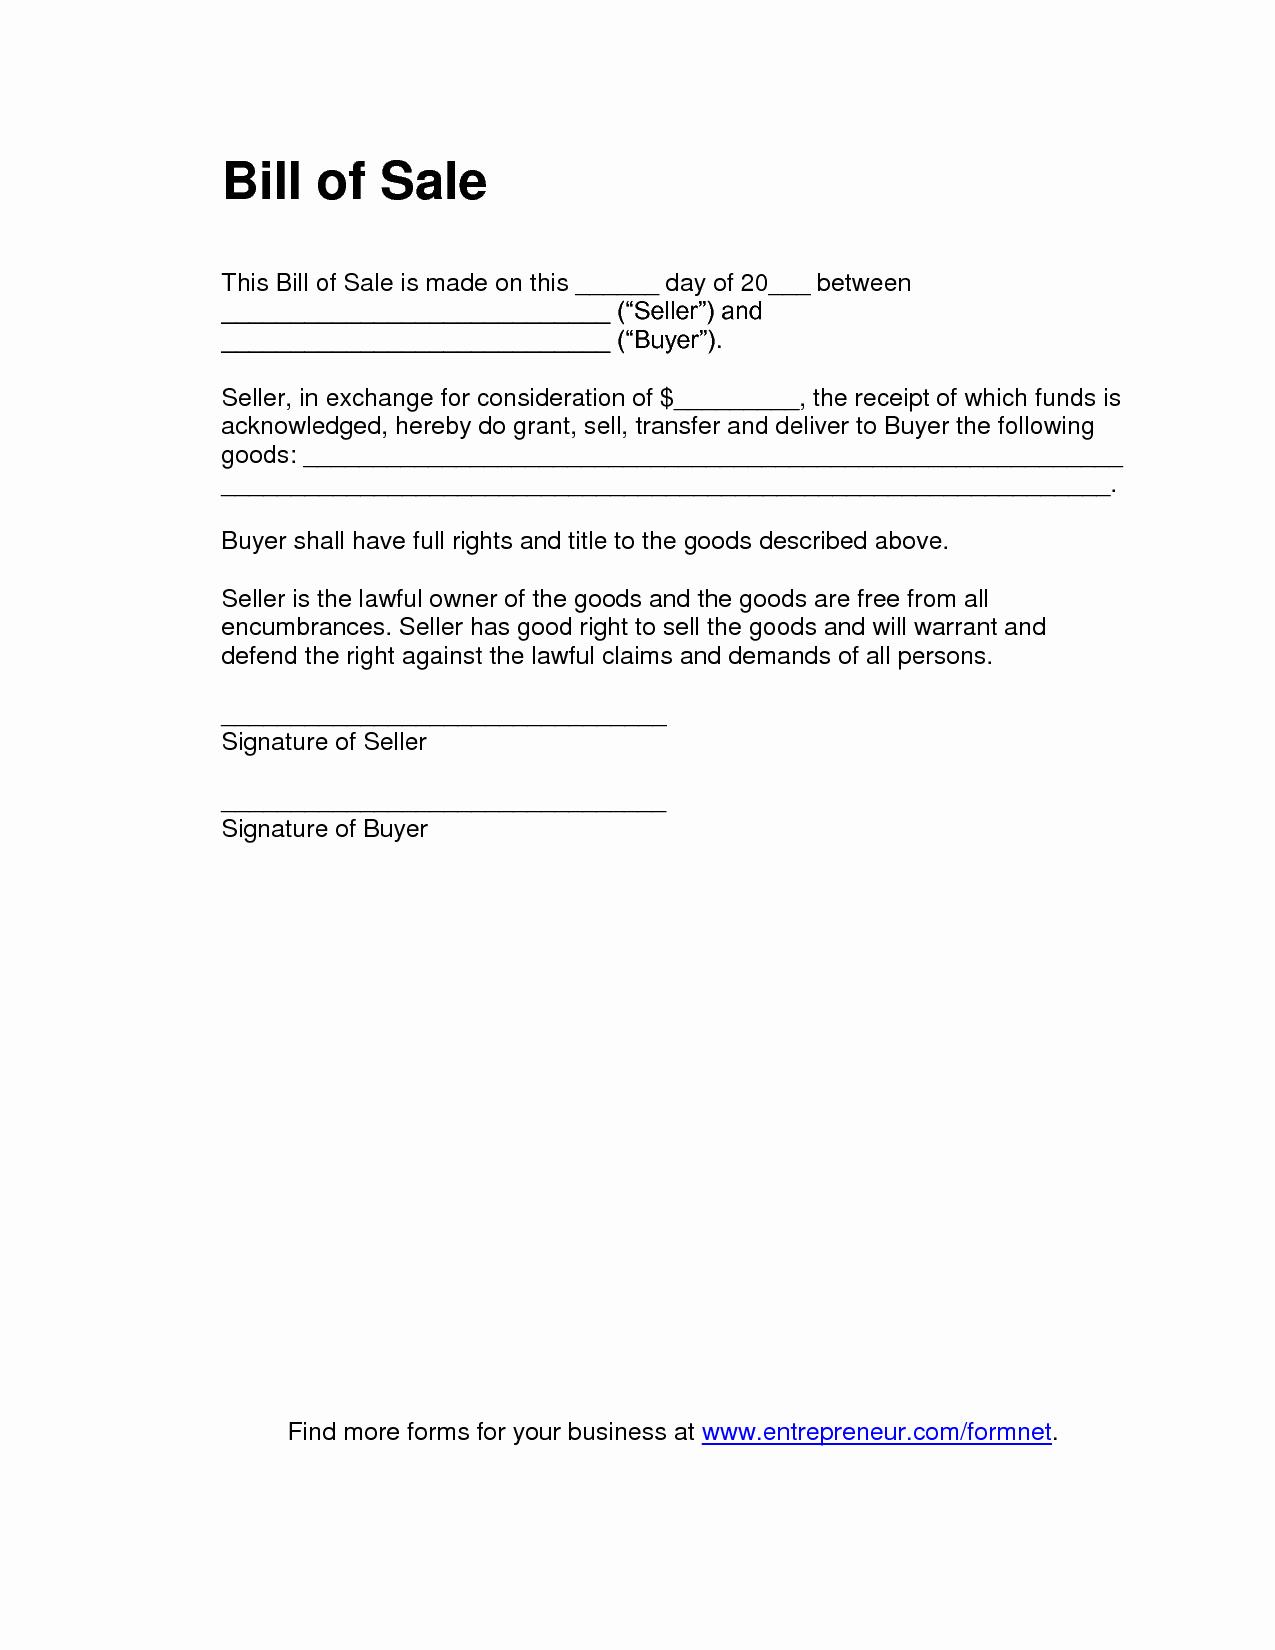 Free Bill Of Sale Templates Elegant Free Printable Bill Of Sale Templates form Generic